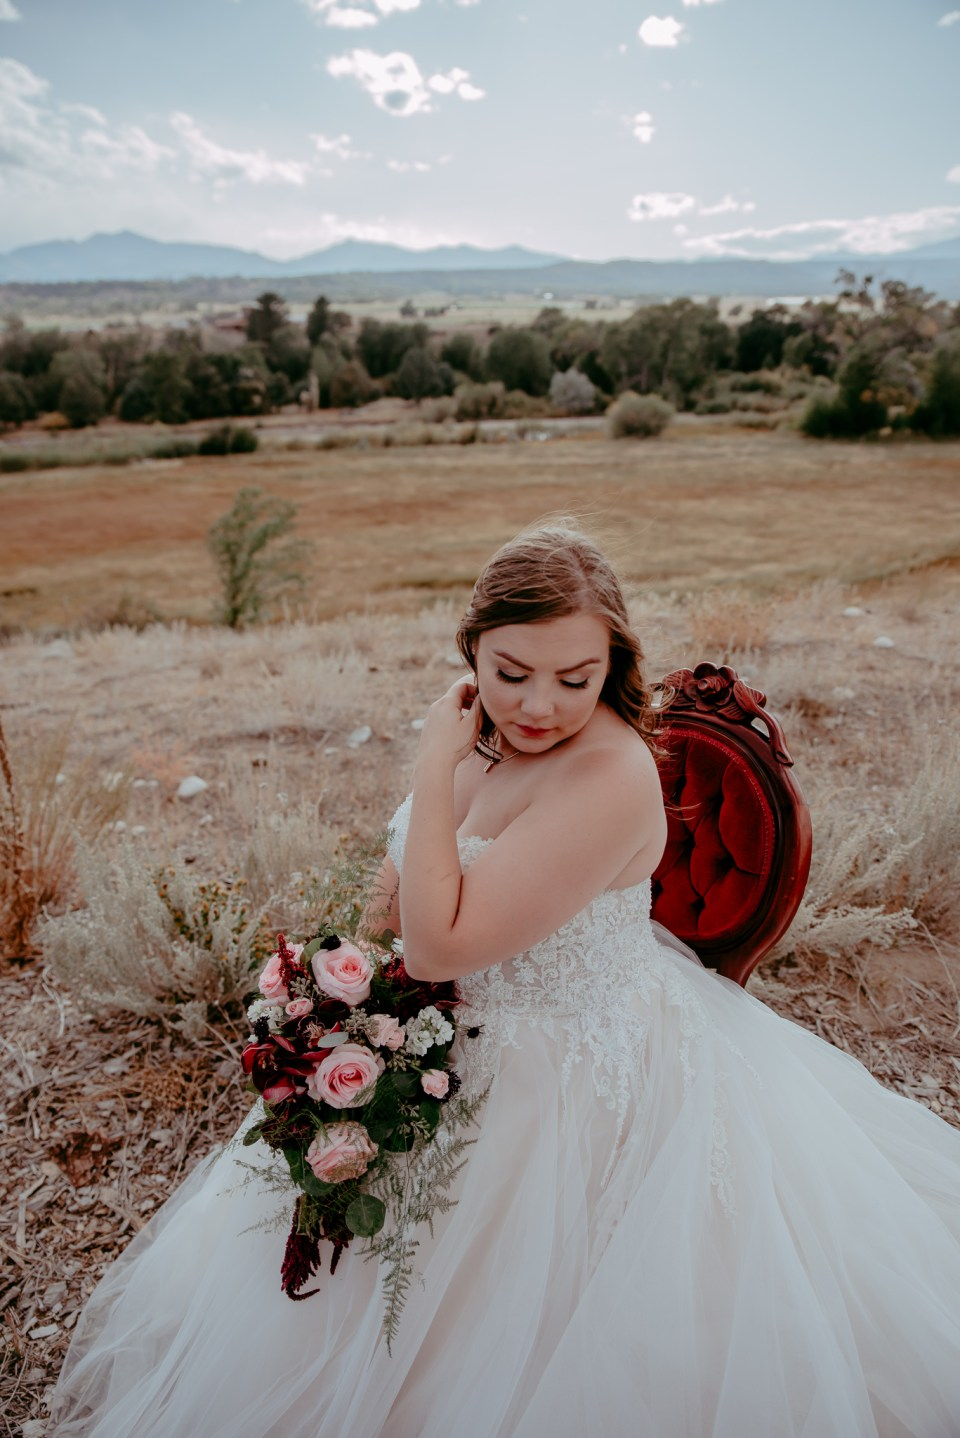 Chelsea Kyaw Photo-Midwest & Iowa Wedding Photographer023